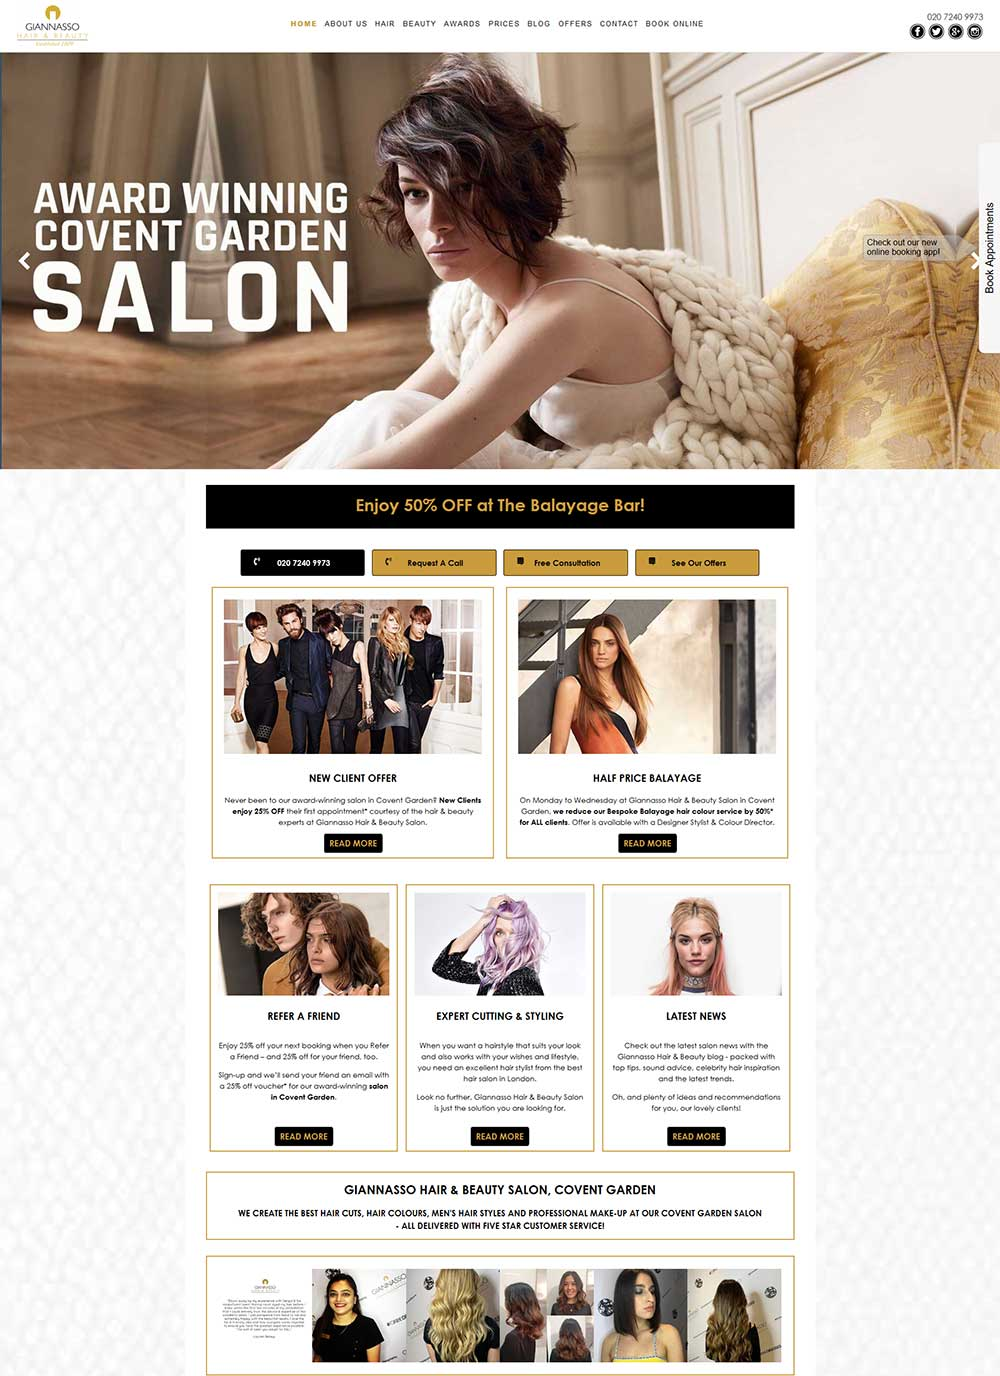 Giannasso Hair Salon website